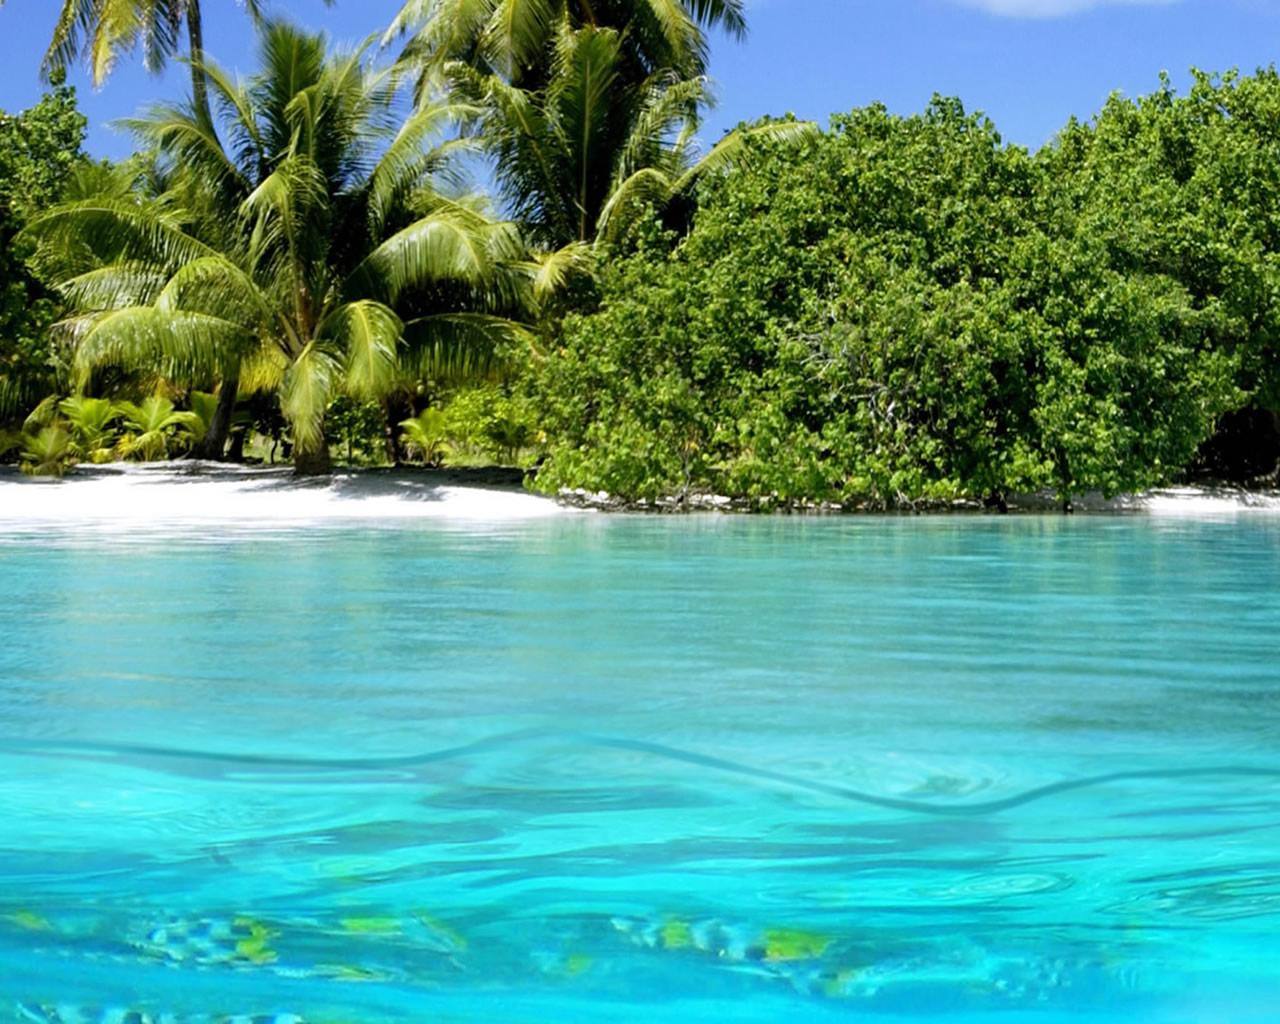 jamaica beaches wallpaper best family beach palm beach aruba 1280x1024